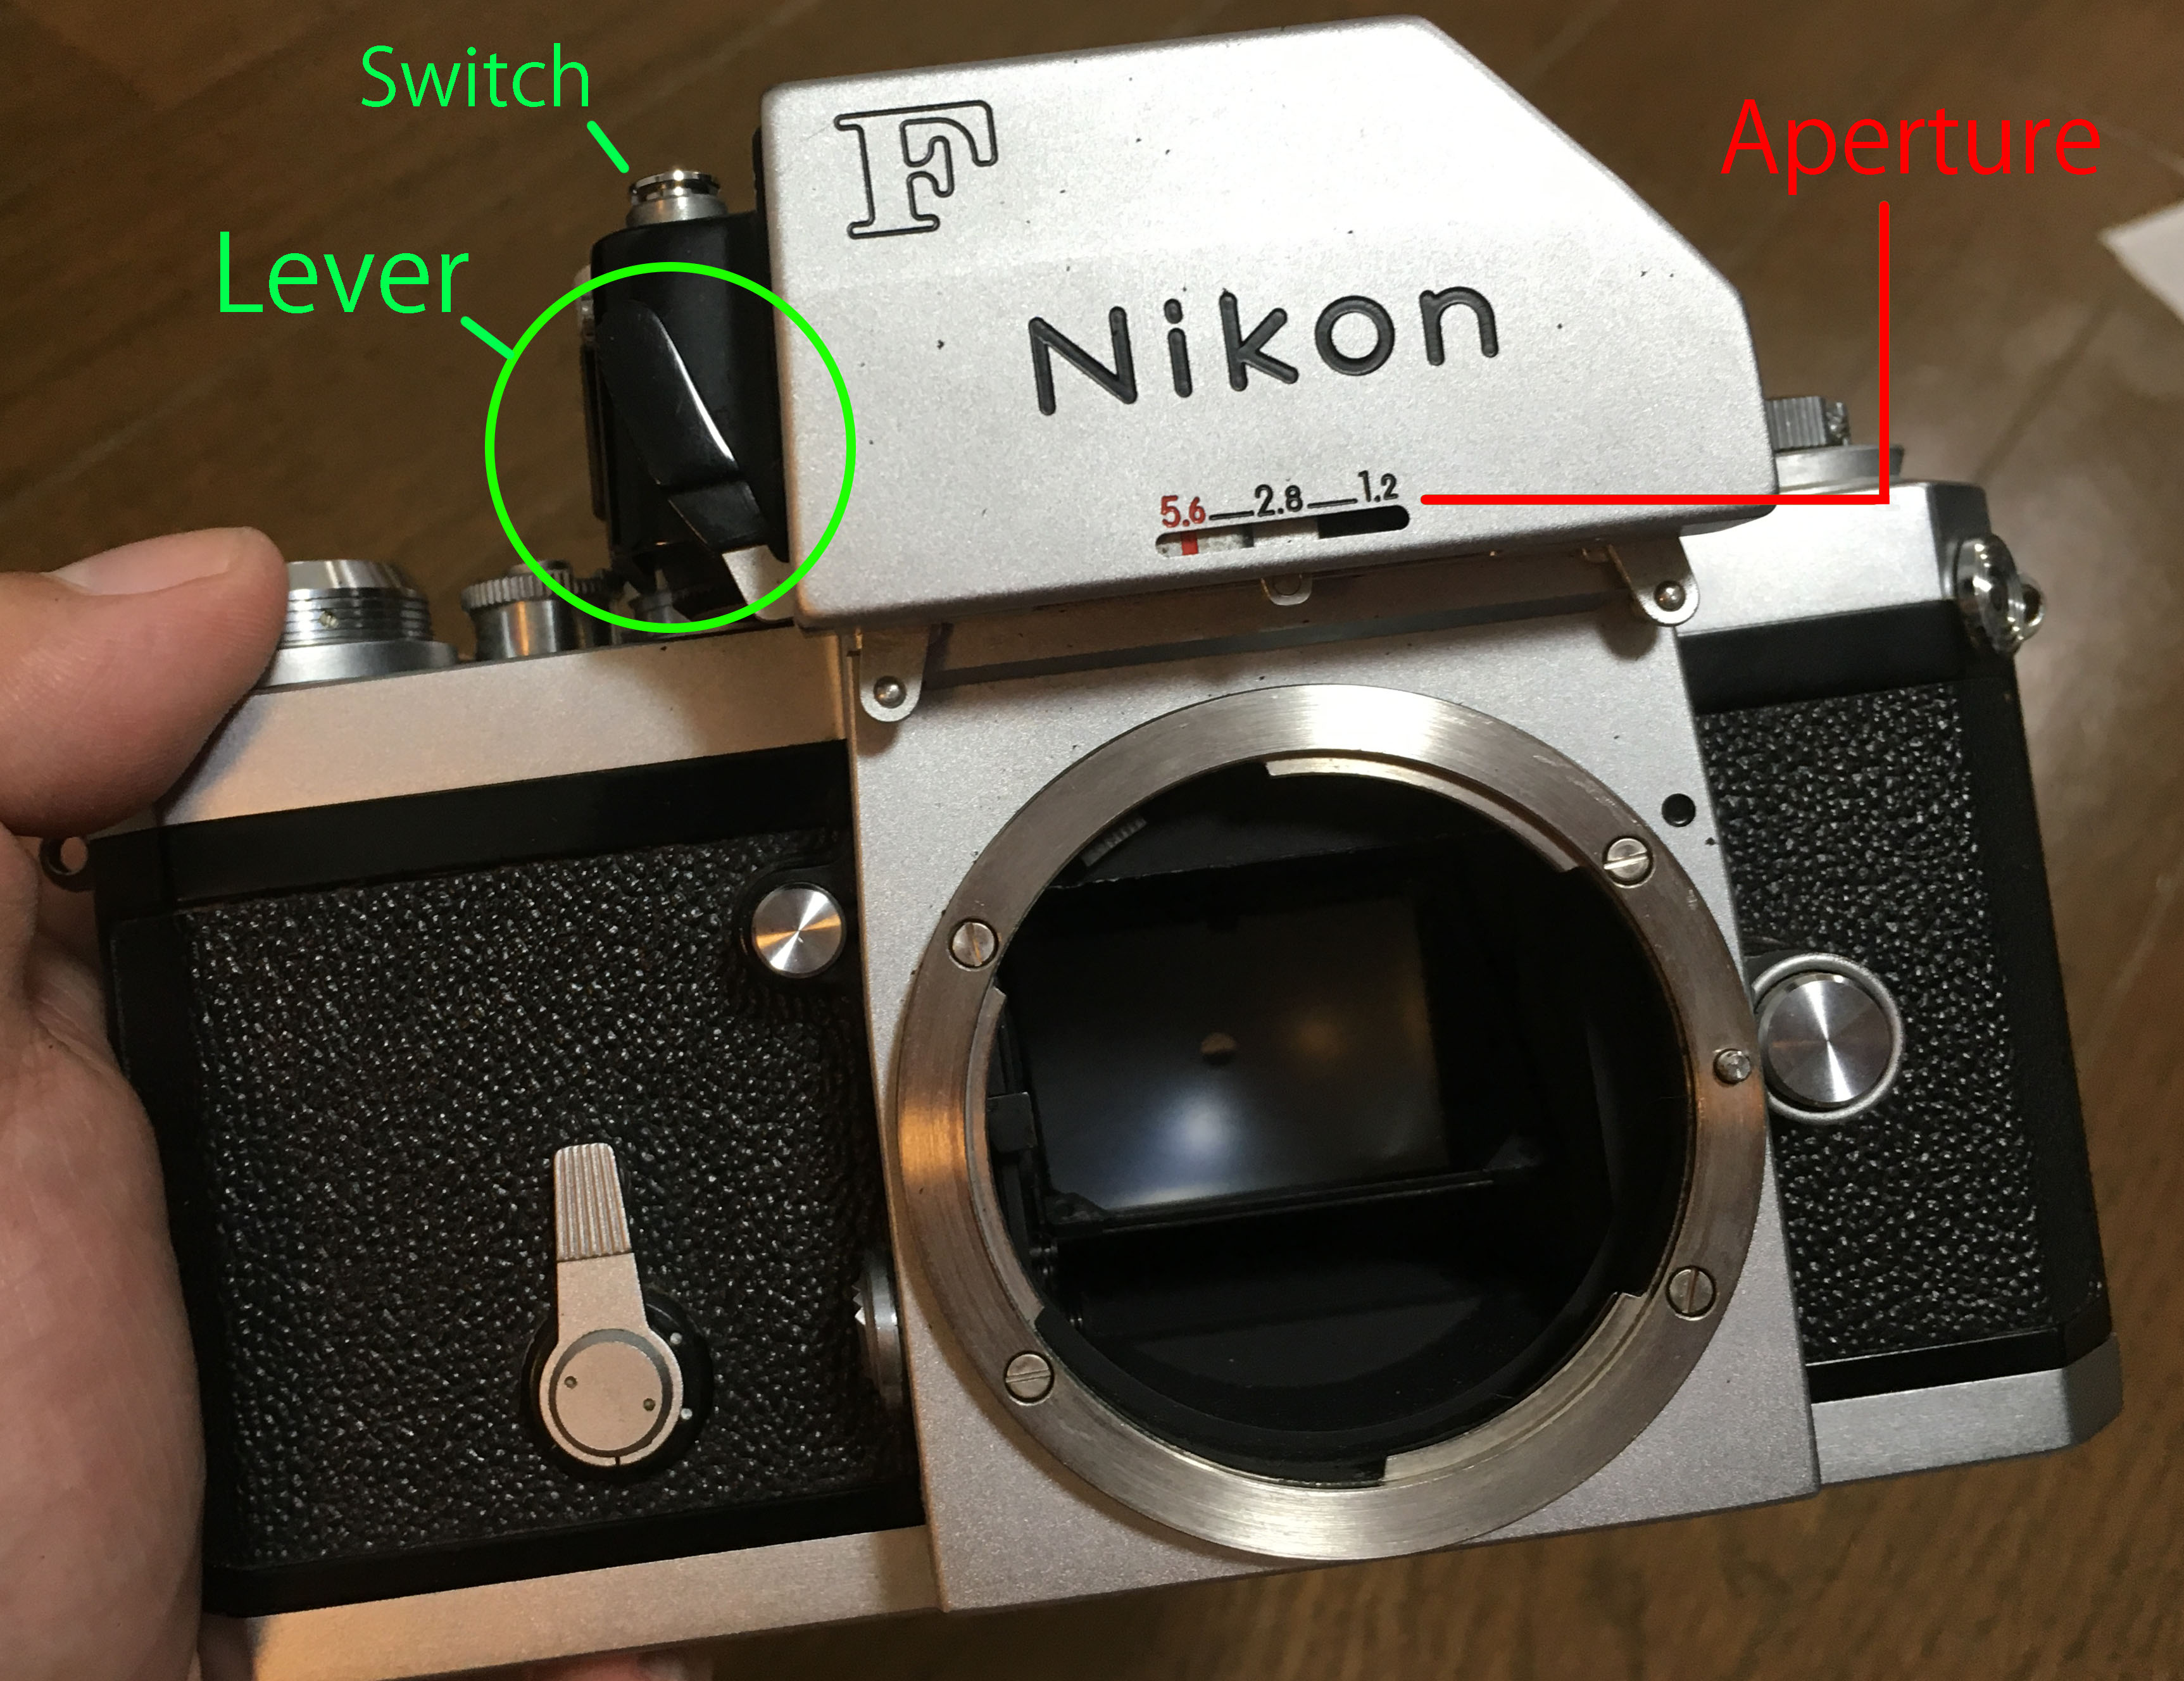 repair nikon f photomic ftn foam richard haw s nikon rh richardhaw com nikon f photomic manuale nikon f photomic instruction manual